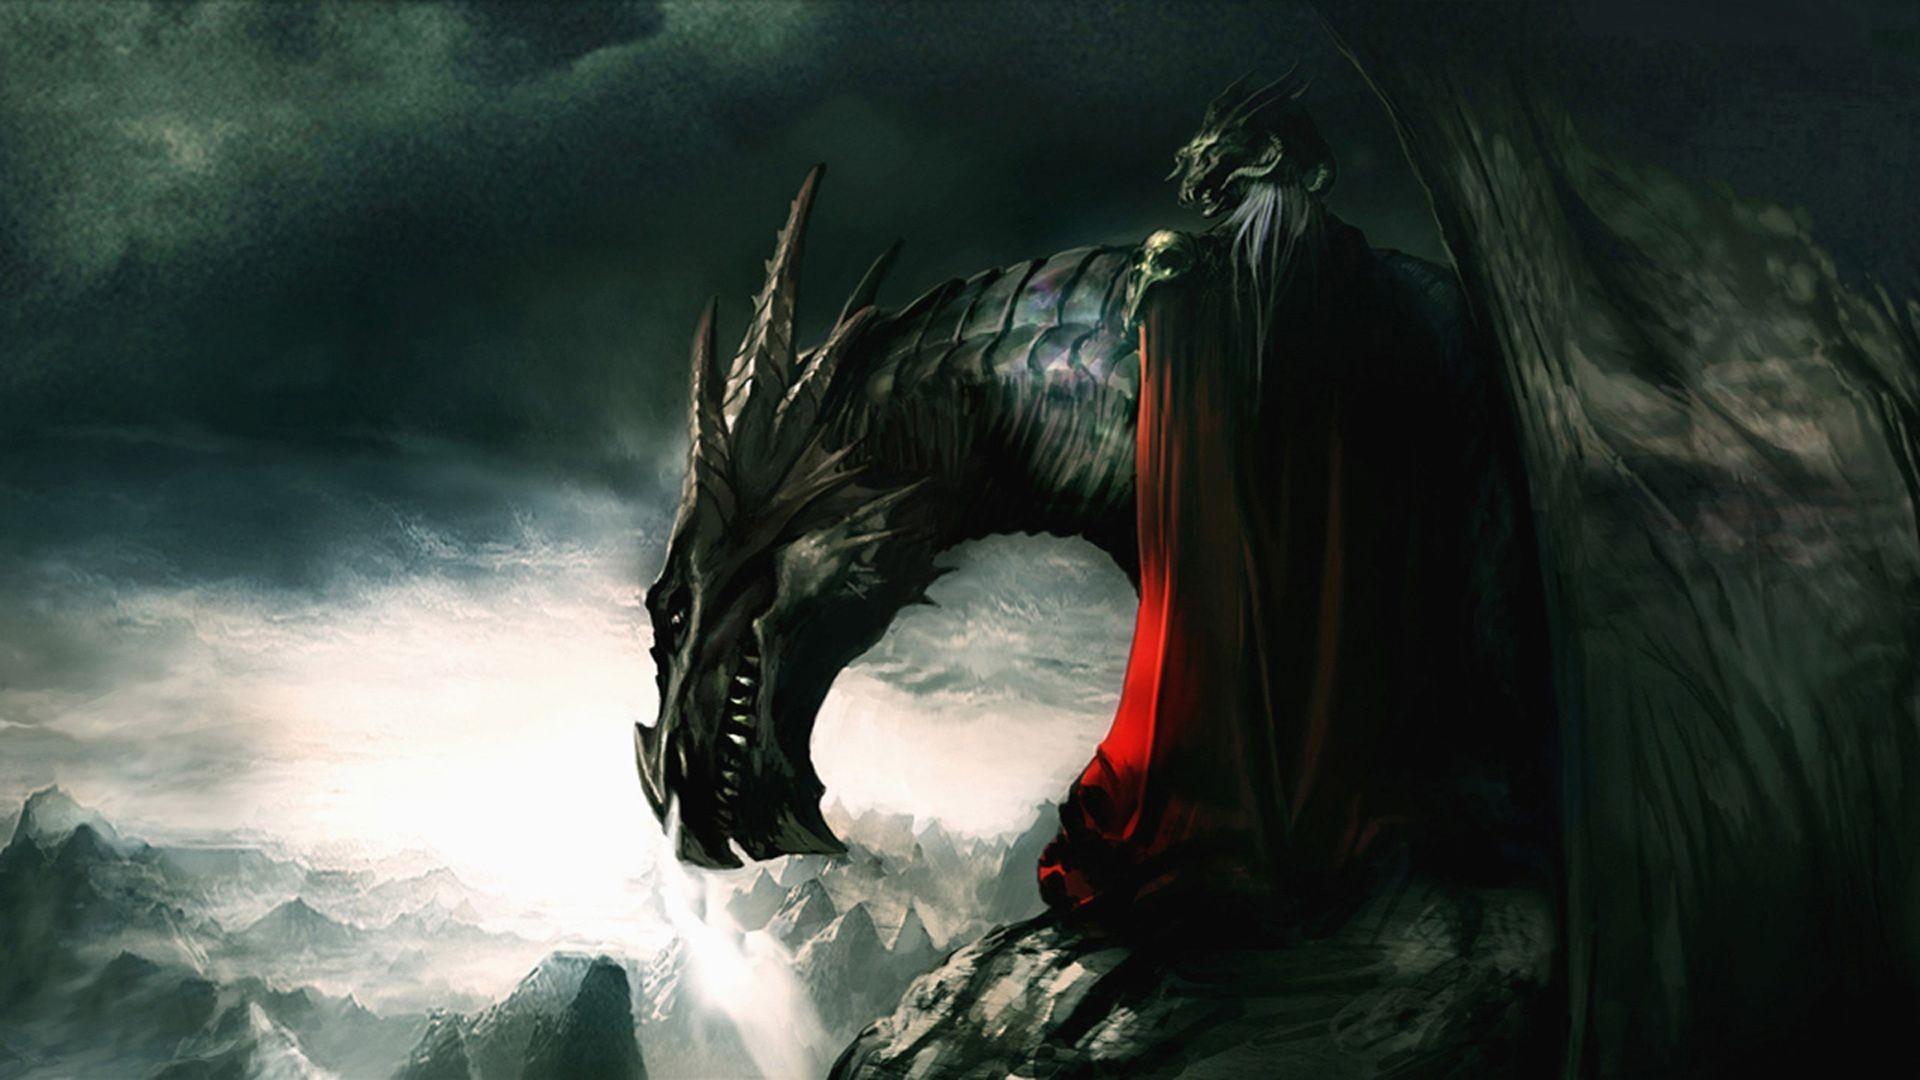 Res: 1920x1080, Full HD p Dragon Wallpapers HD, Desktop Backgrounds 1920×1080 Dragon HD  Wallpapers 1080p